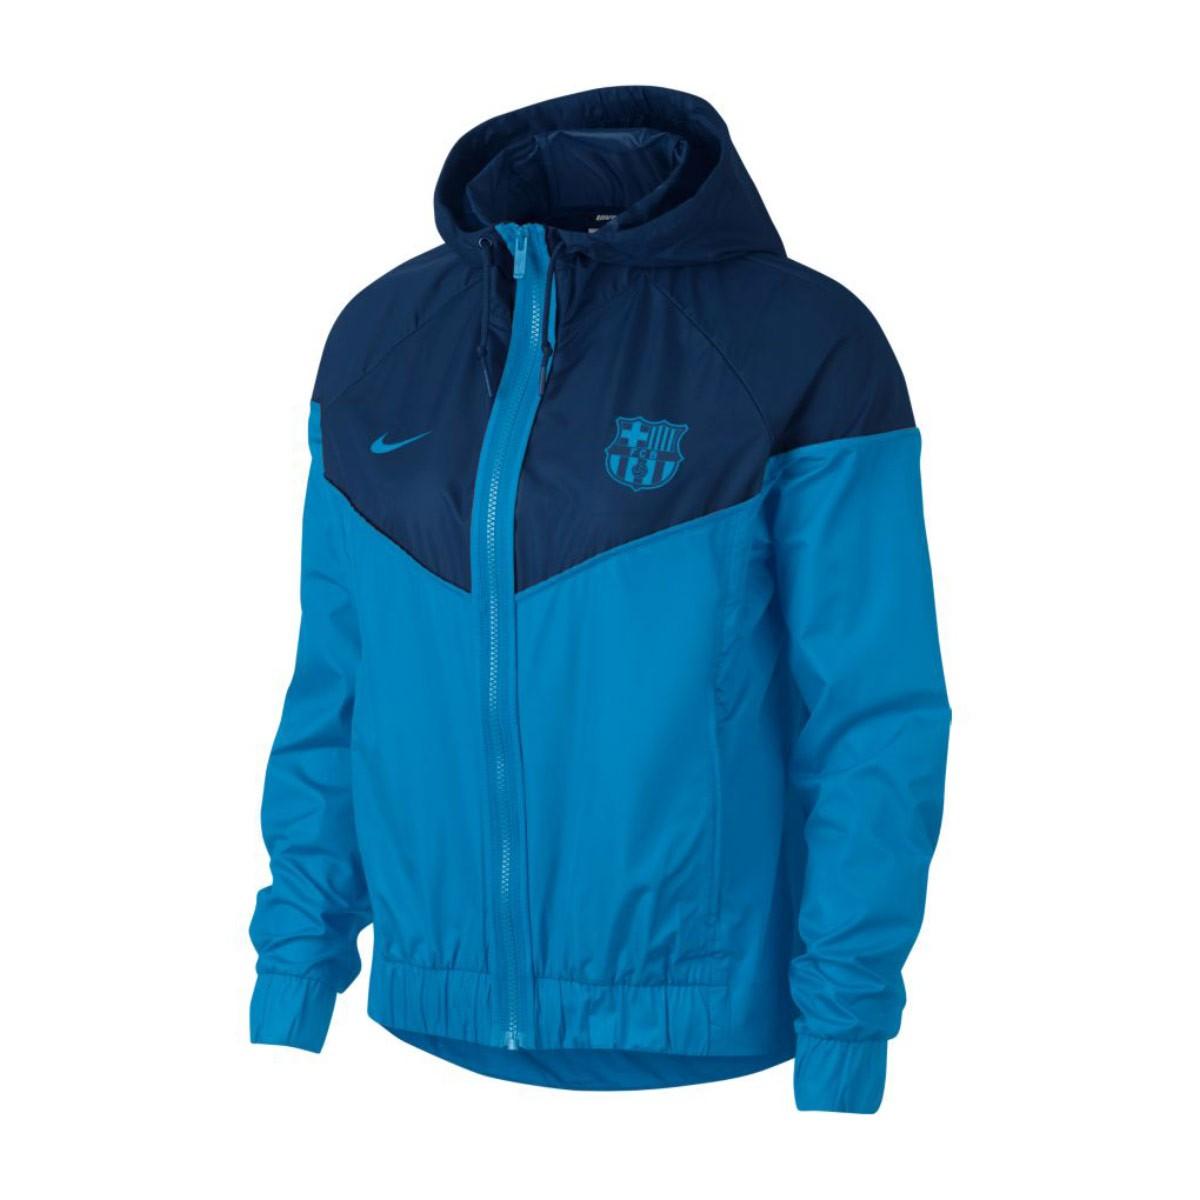 Nike Nike Sportswear FC Barcelona Windrunner 2018-2019 Mujer Jacket. Equator  blue-Coastal ... 17a6a2ae5